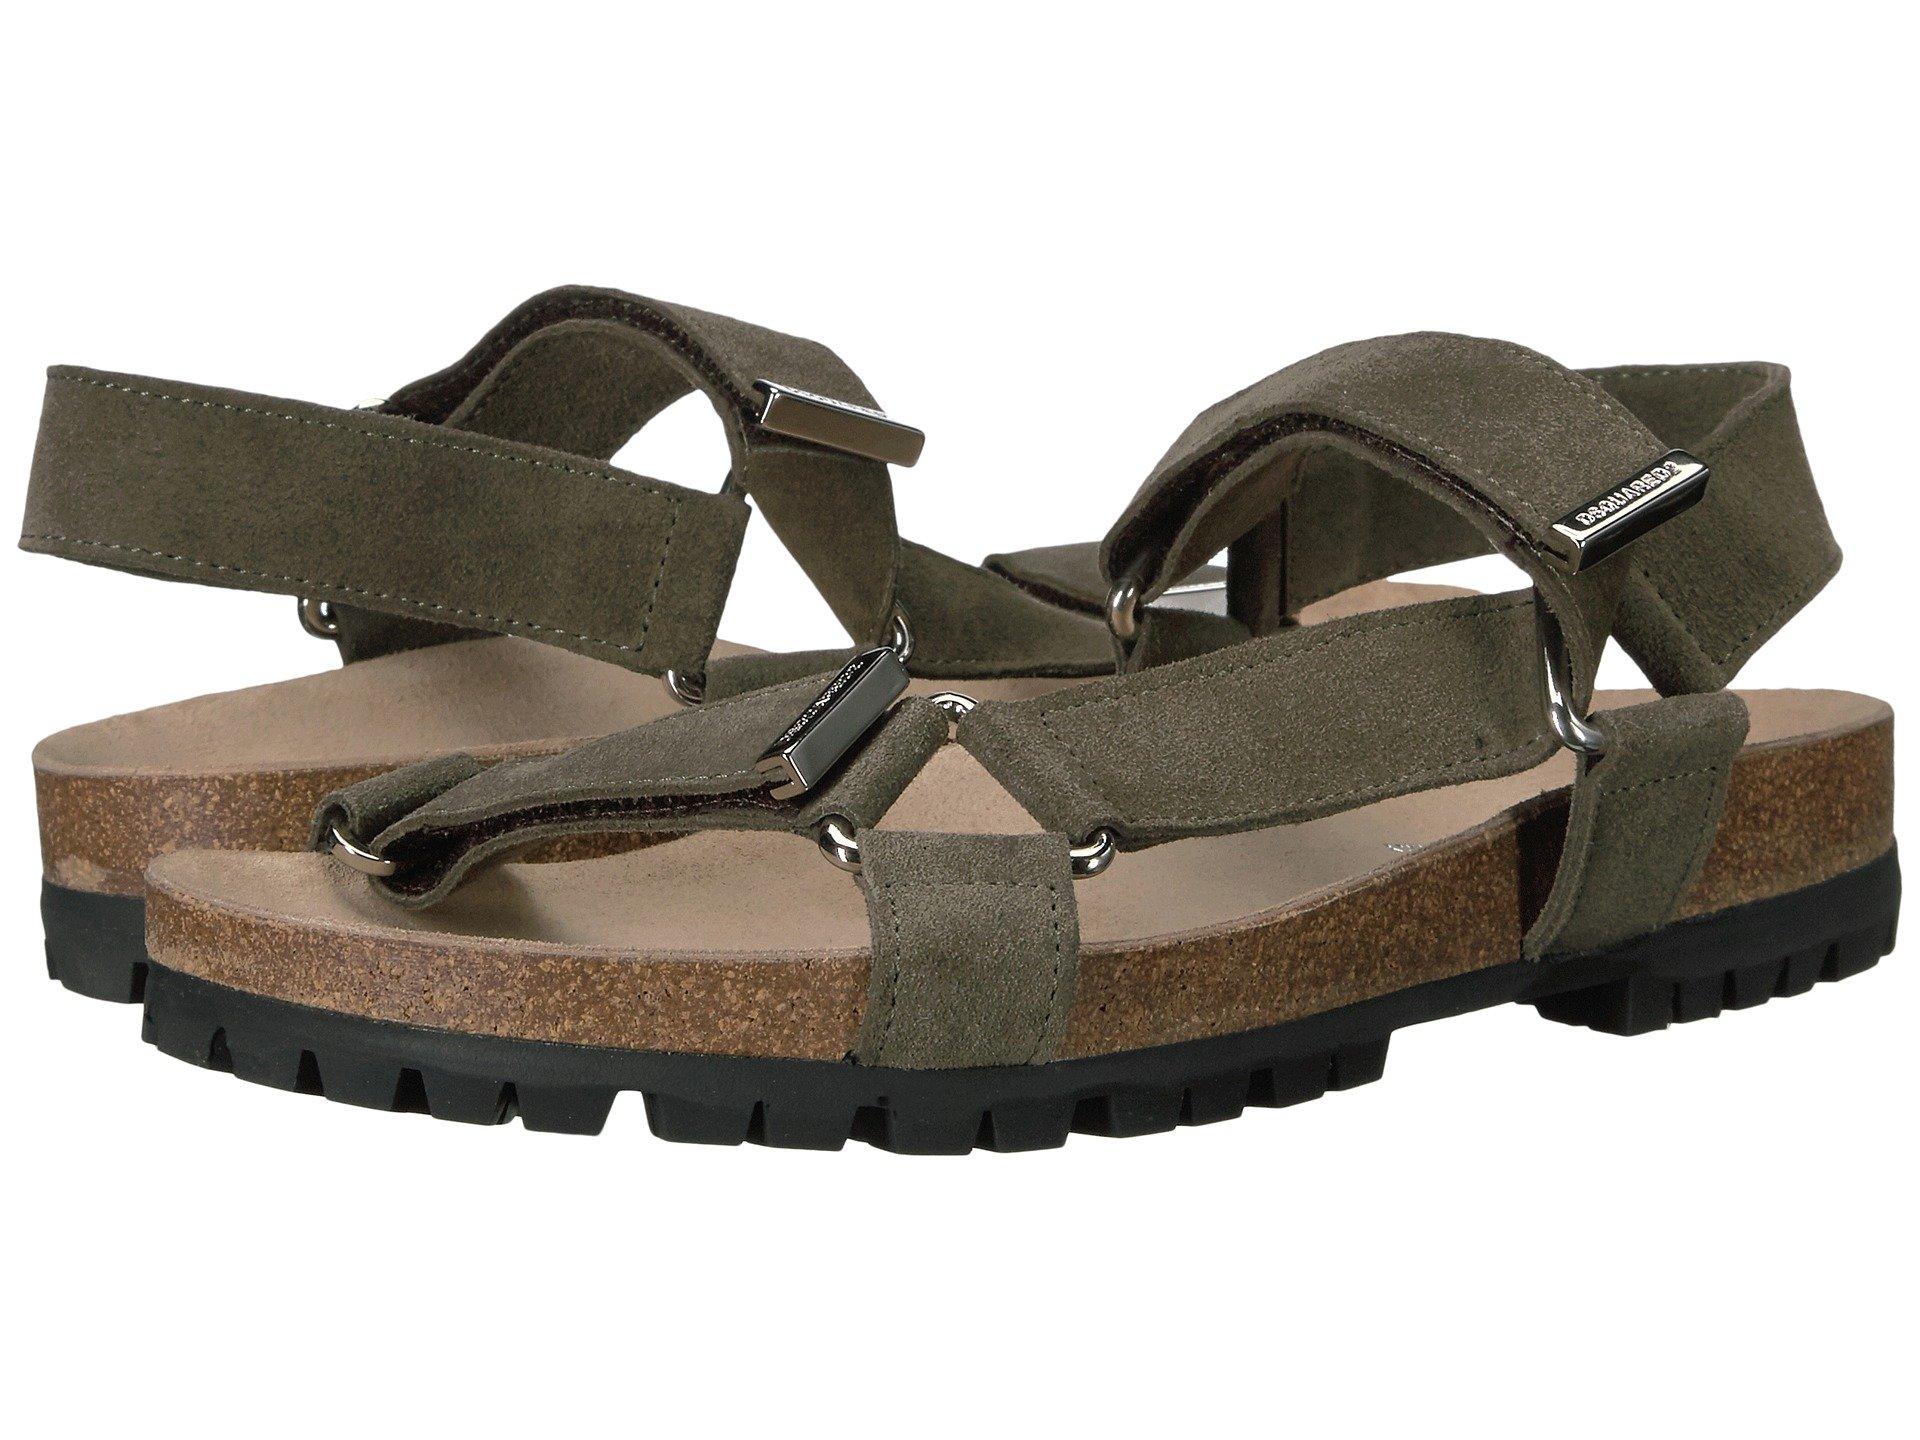 DSQUARED2 Berk Suede Sandal